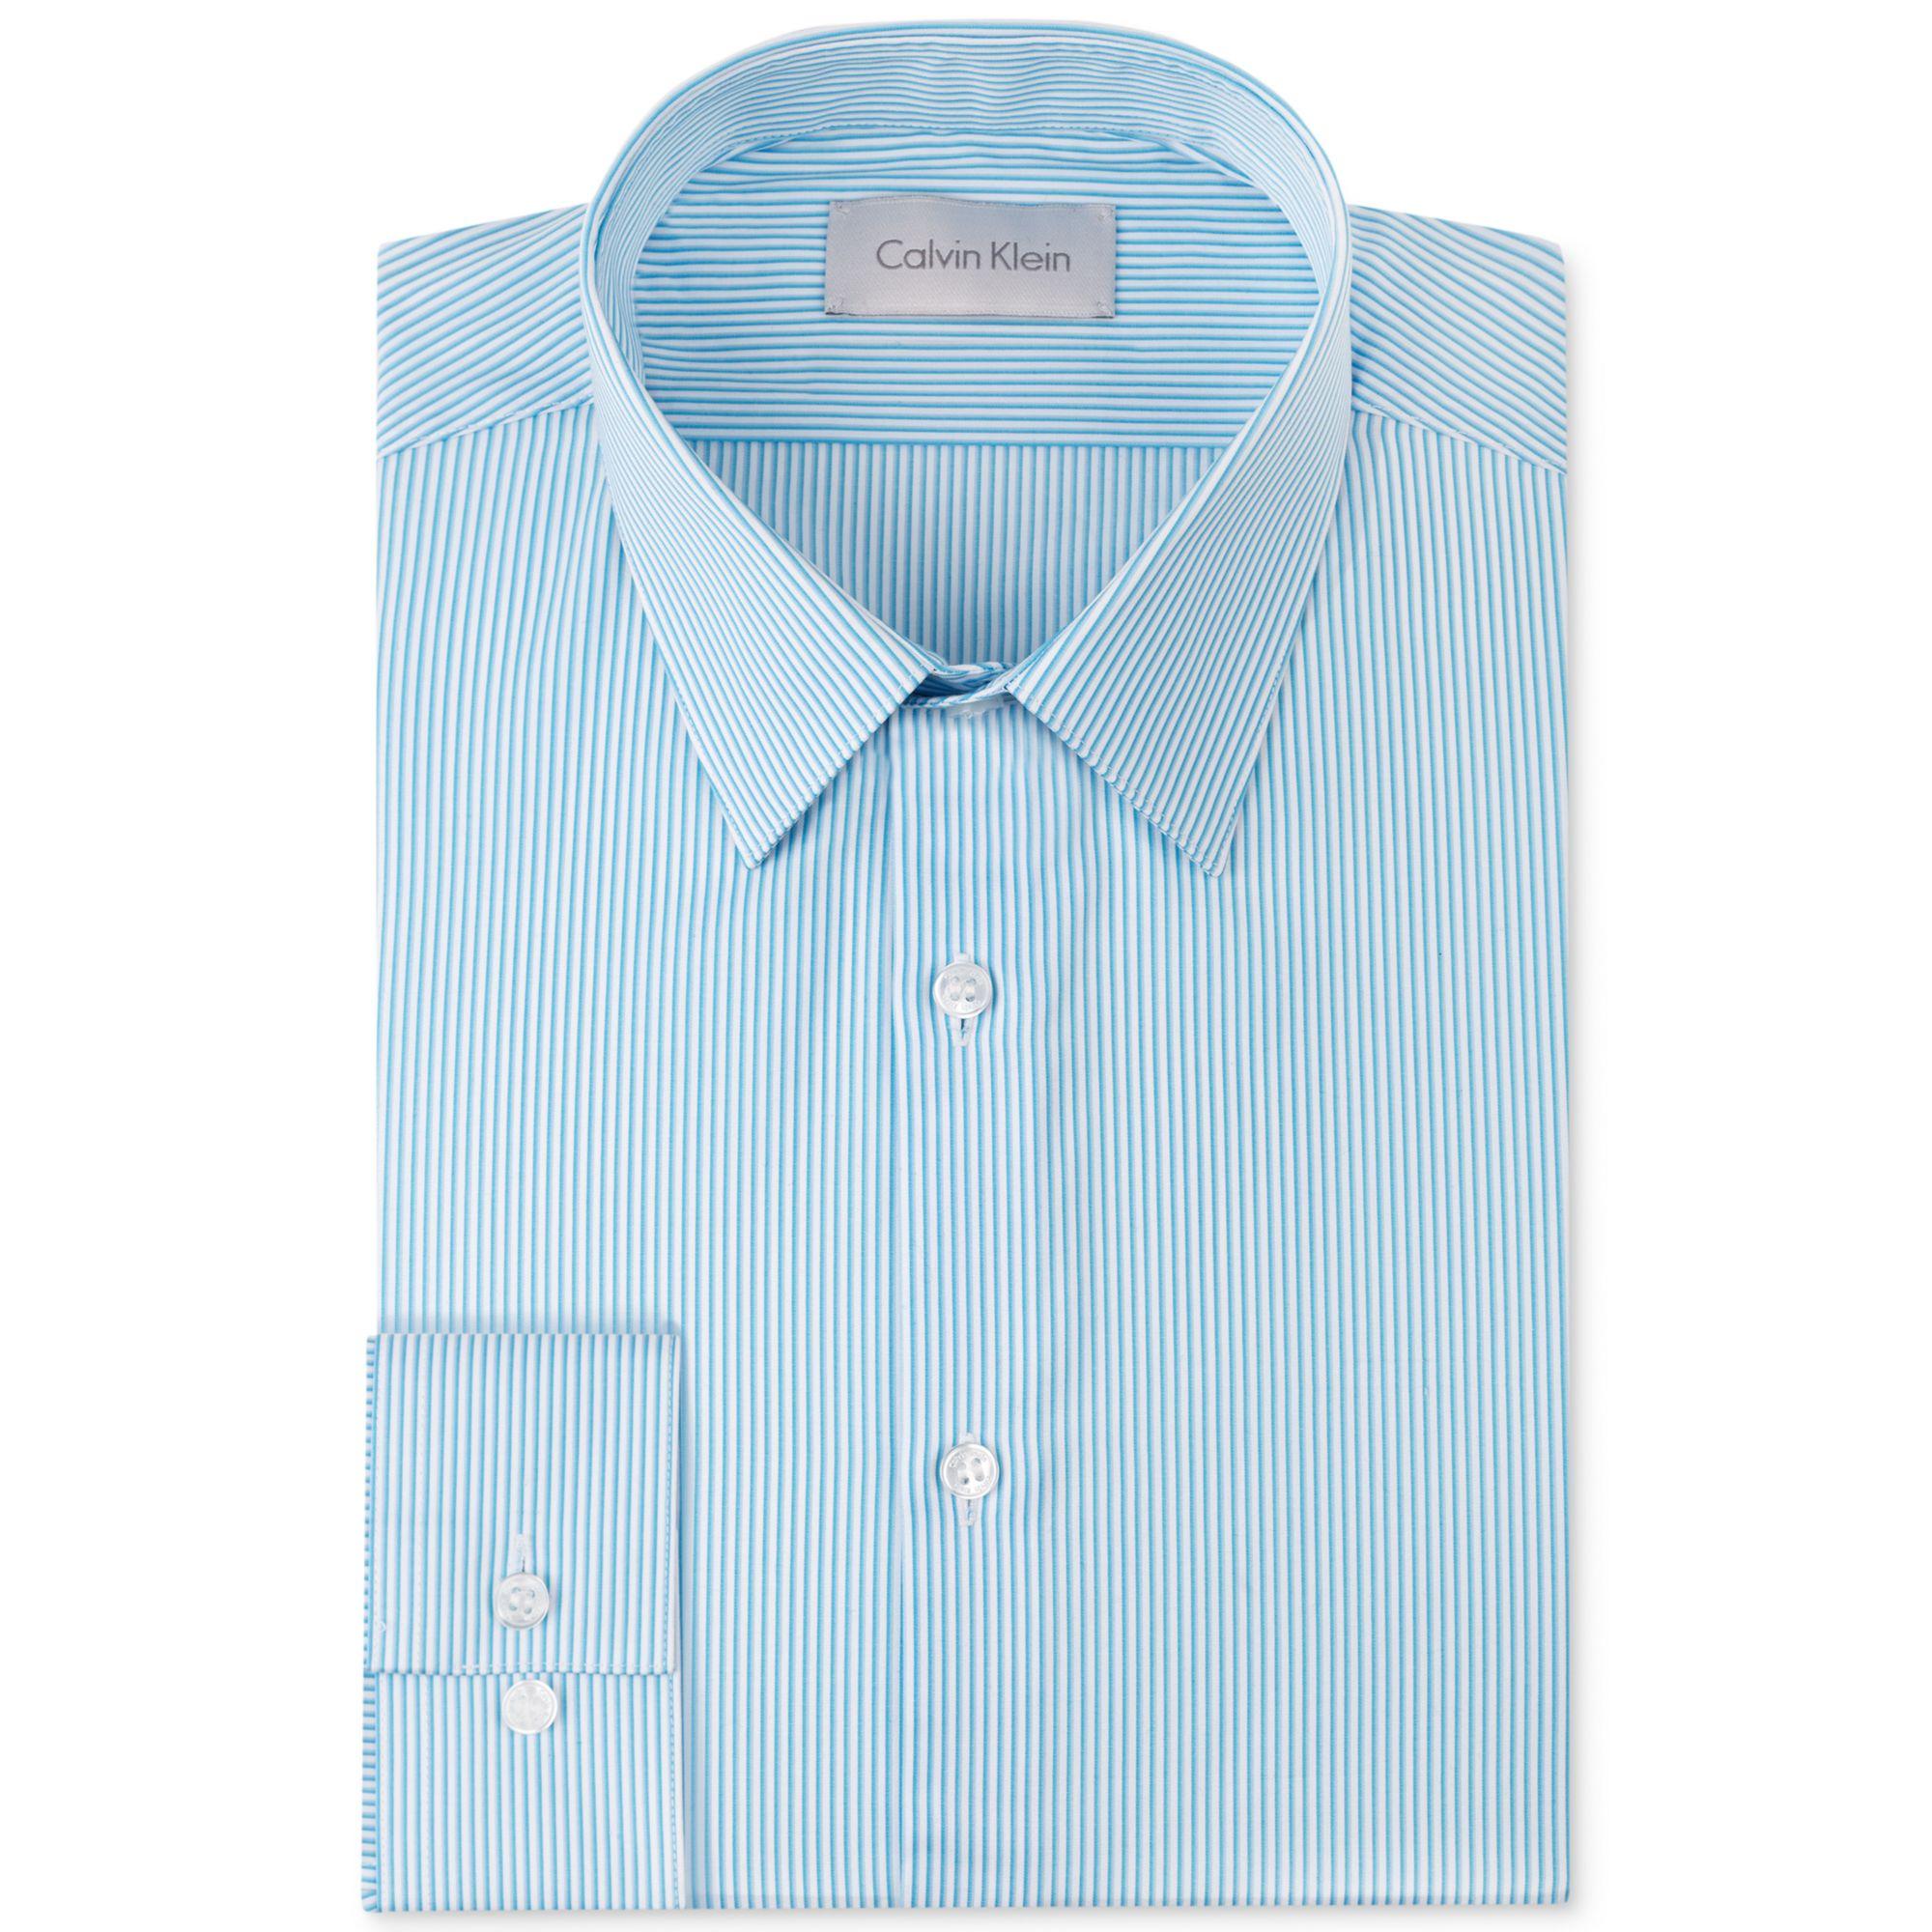 Calvin Klein Platinum Slimfit Aqua Stripe Dress Shirt In